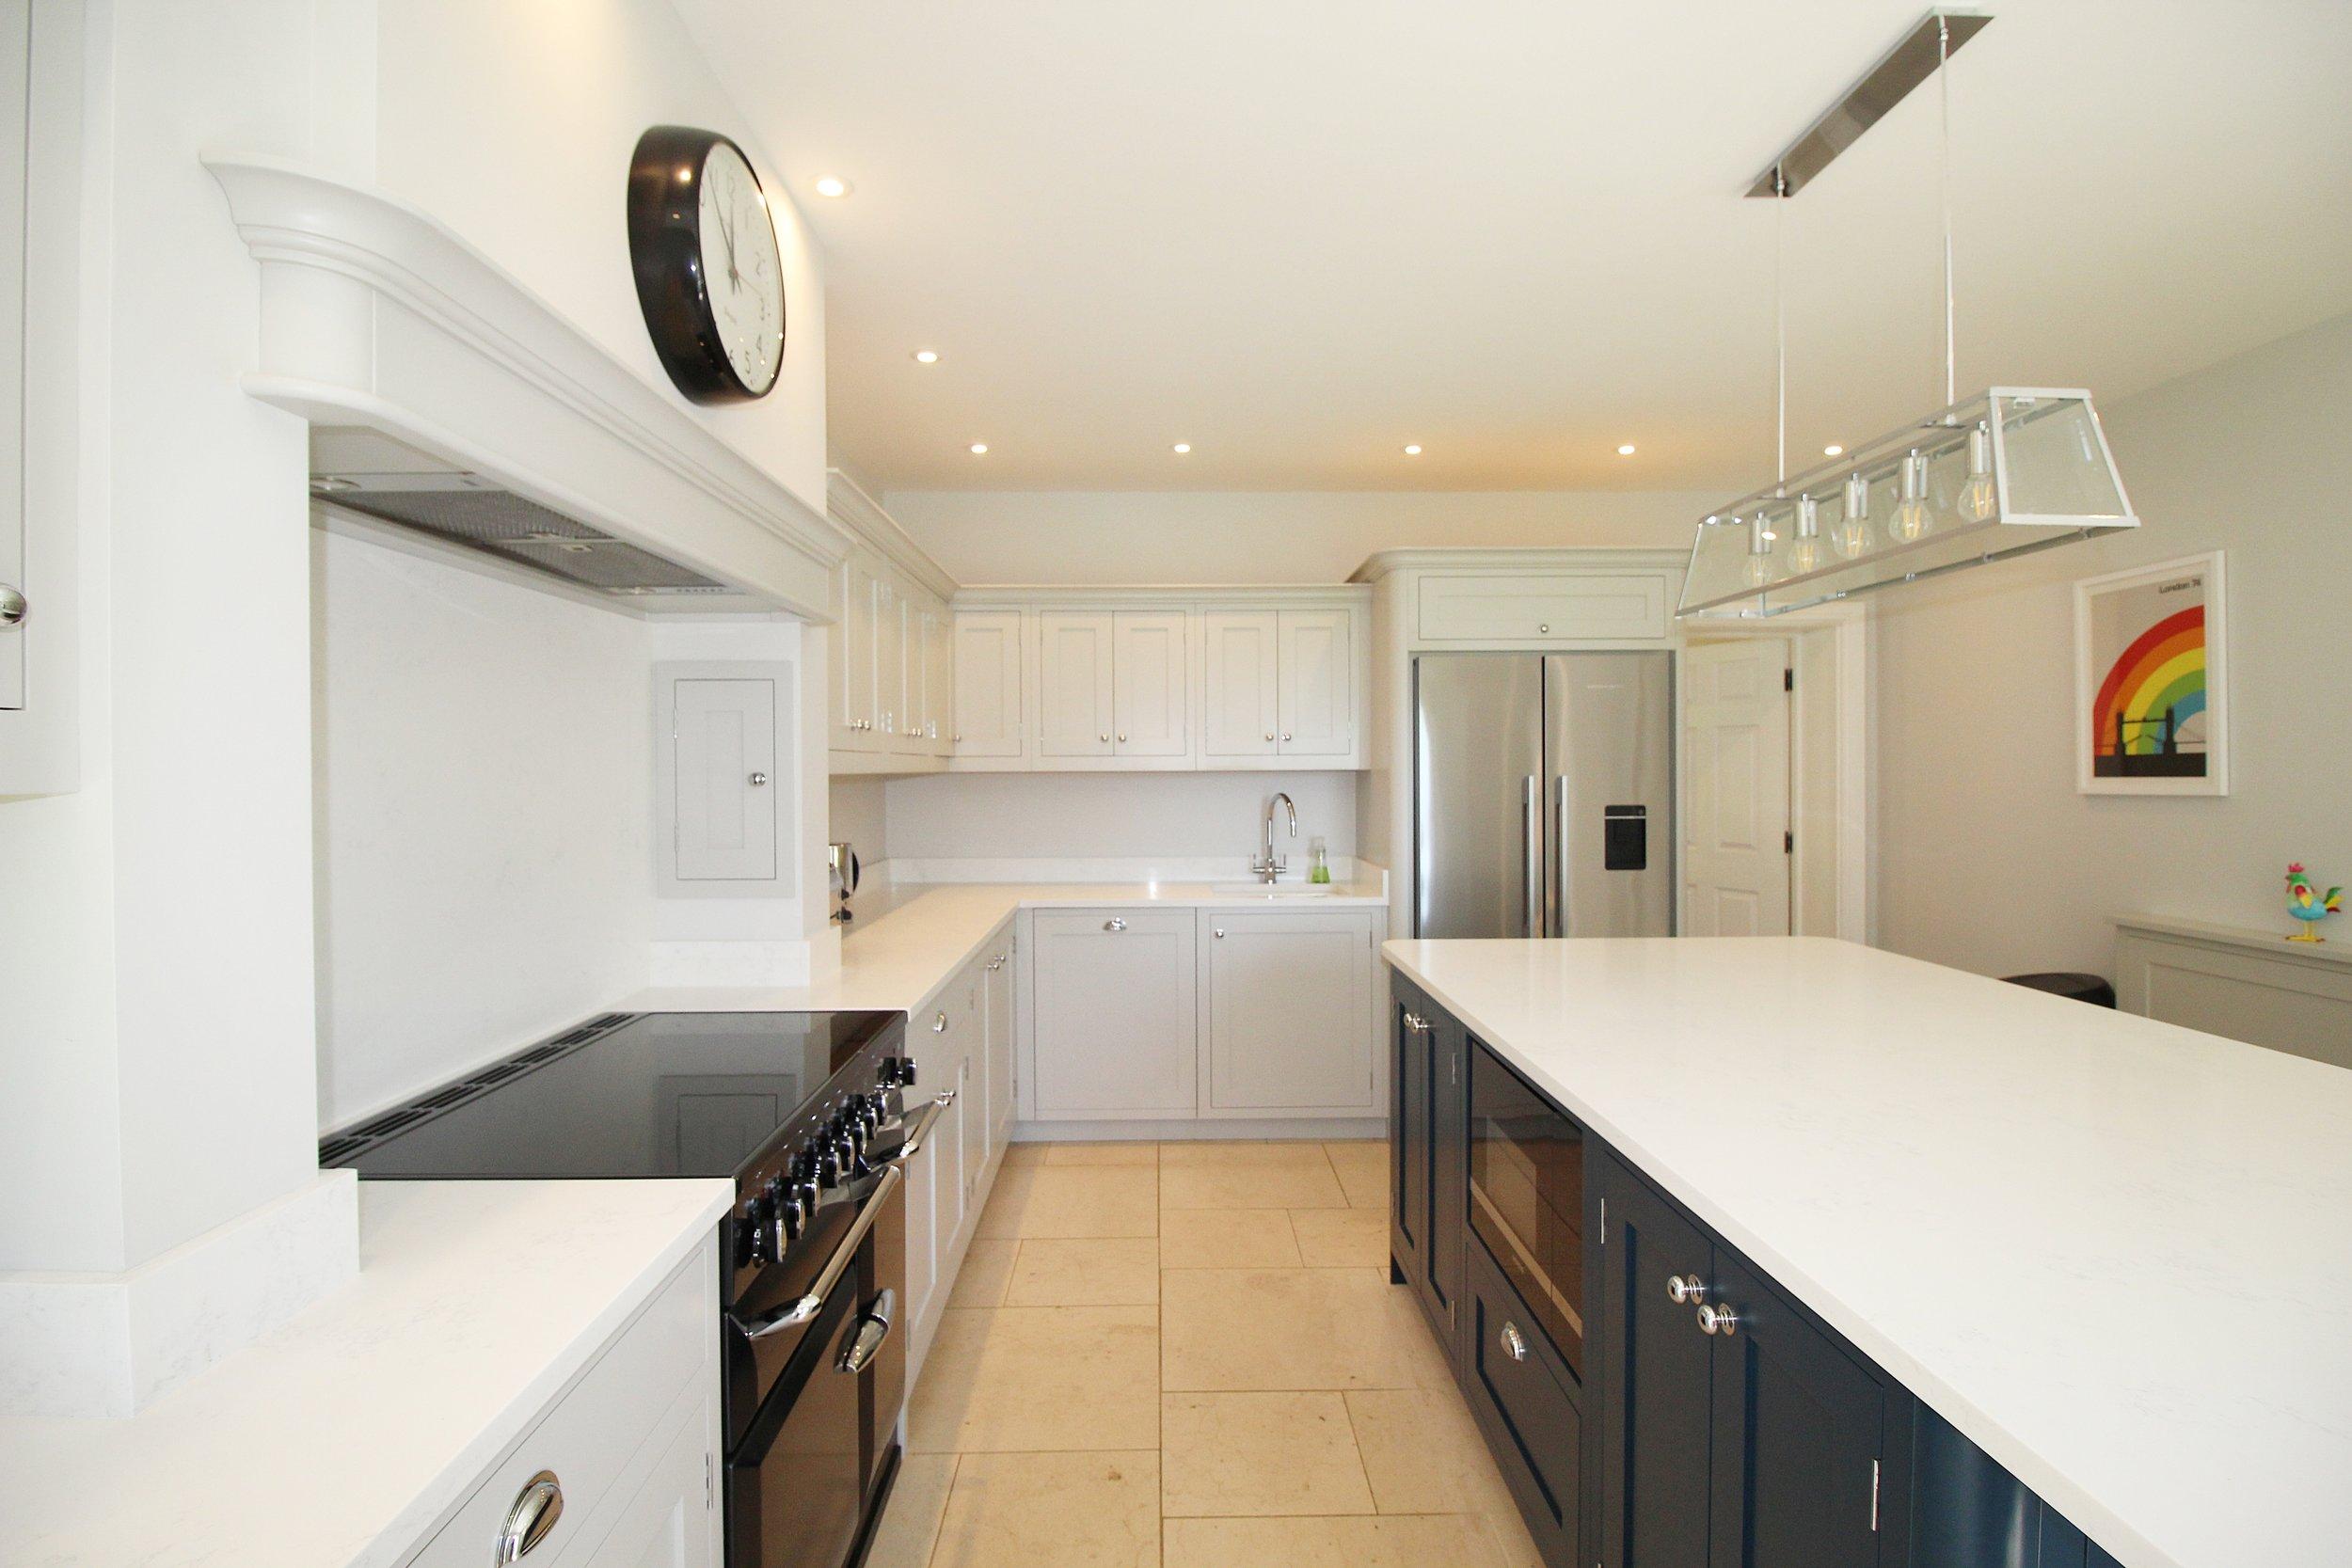 Norton-house-bespoke-kitchen-kent